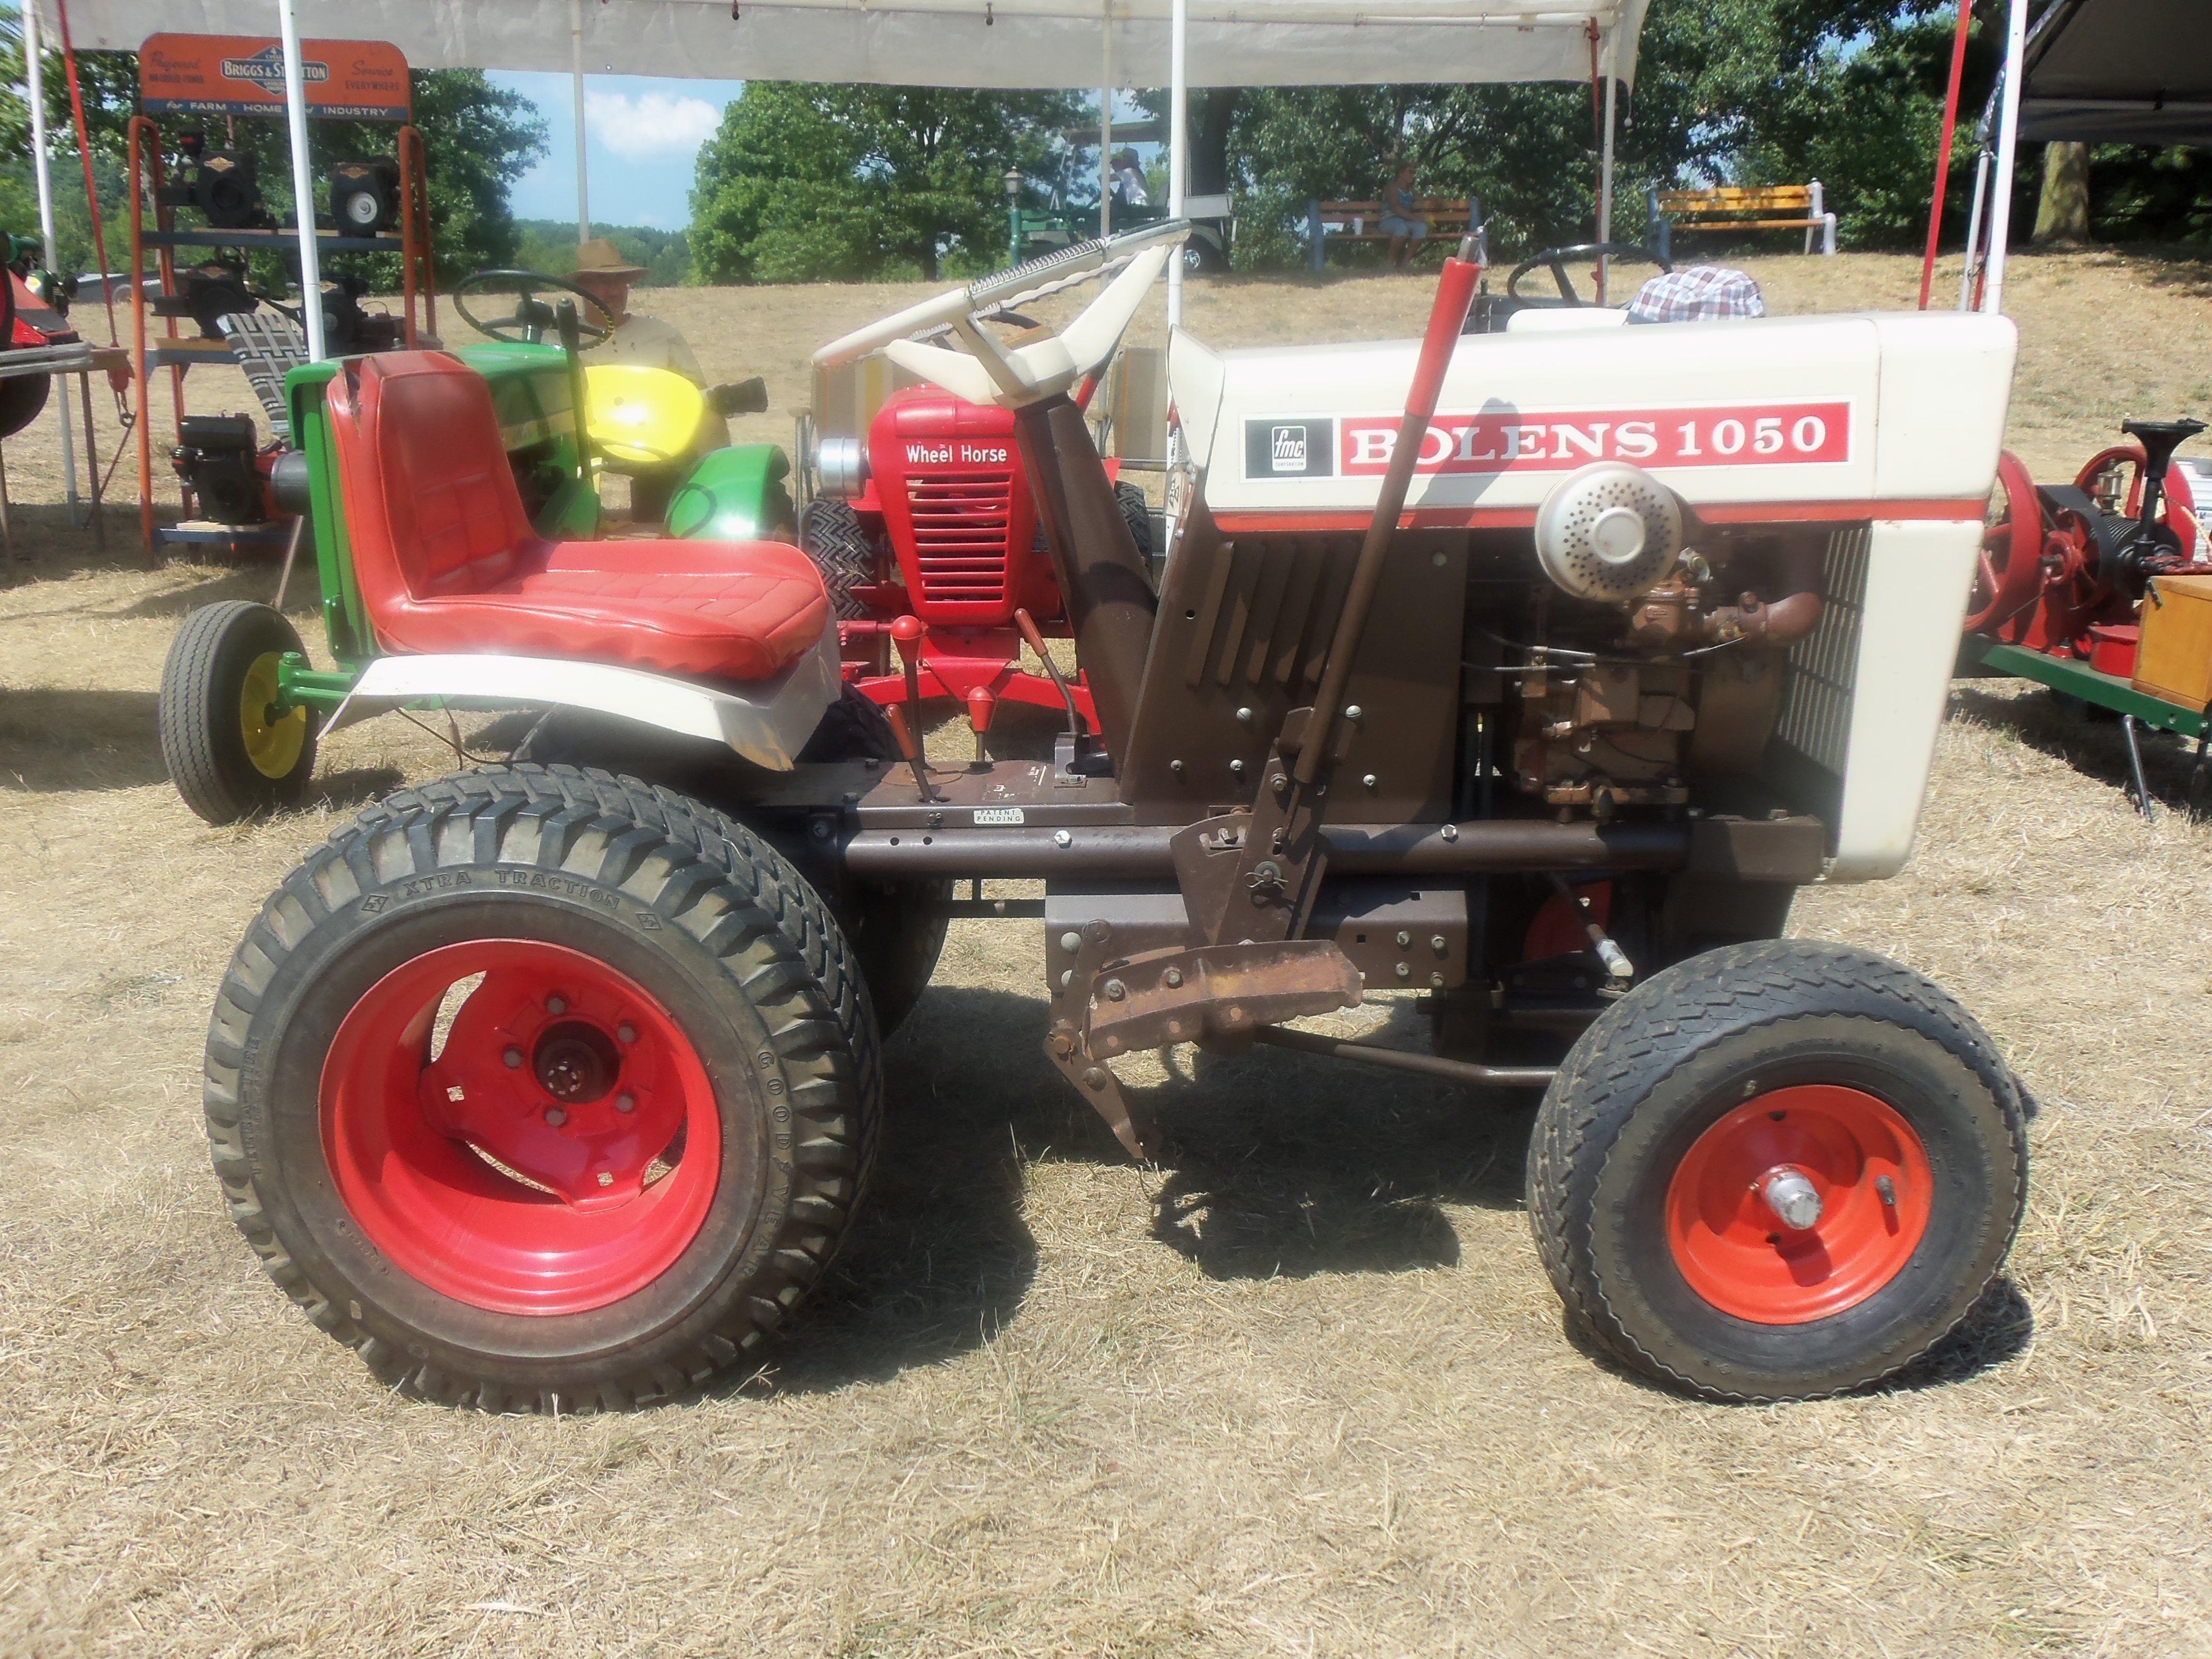 Bolens Lawn Tractor : Bolens garden tractor farm equipment pinterest